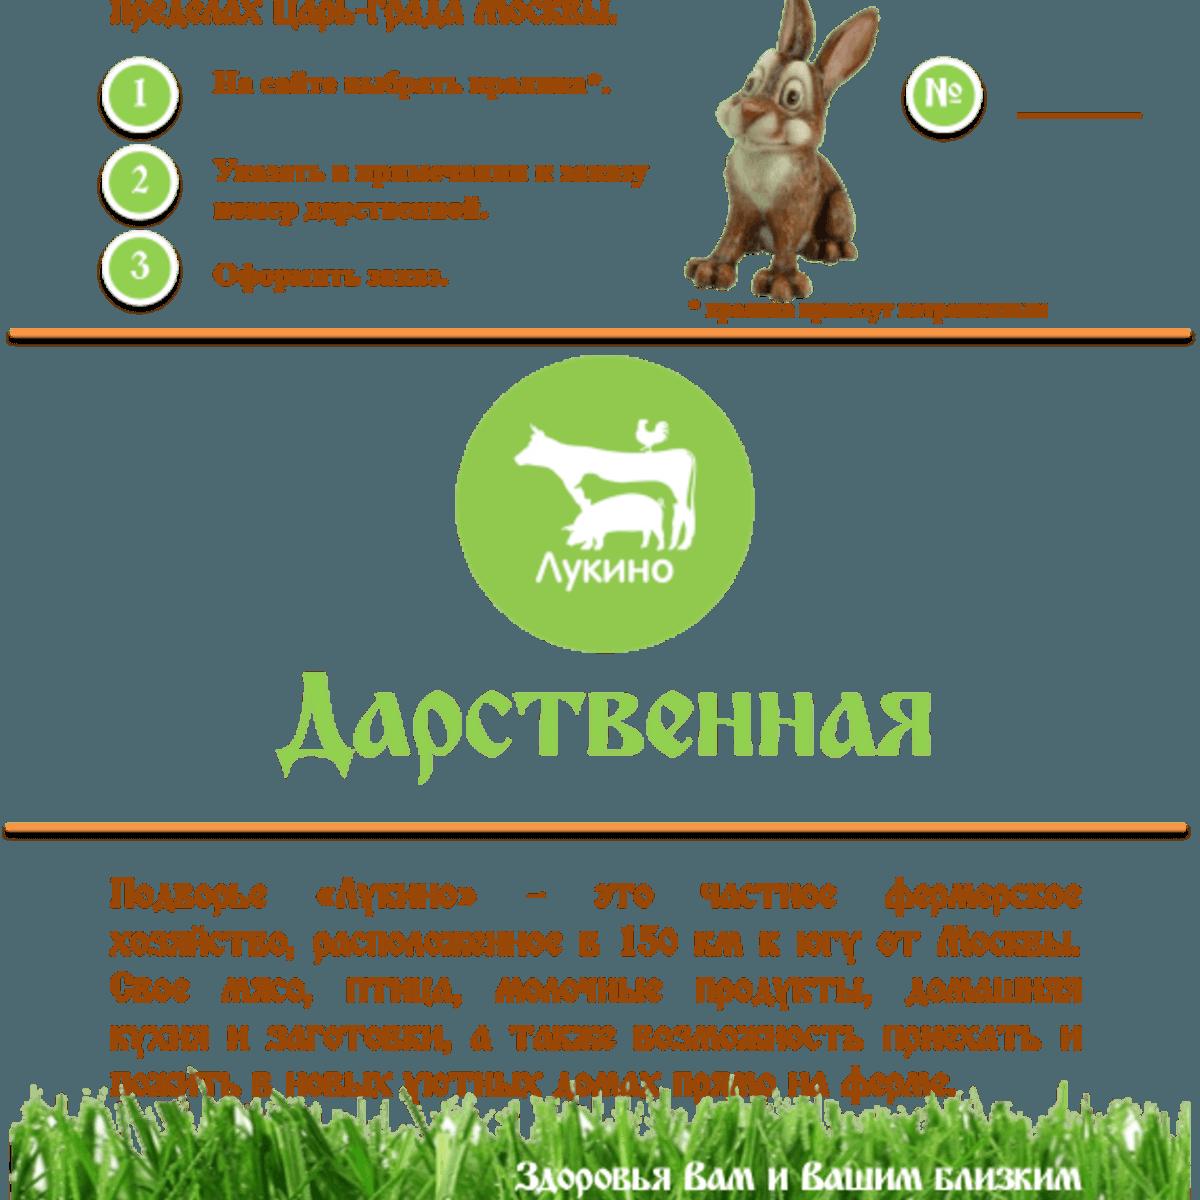 Сертификат на кролика